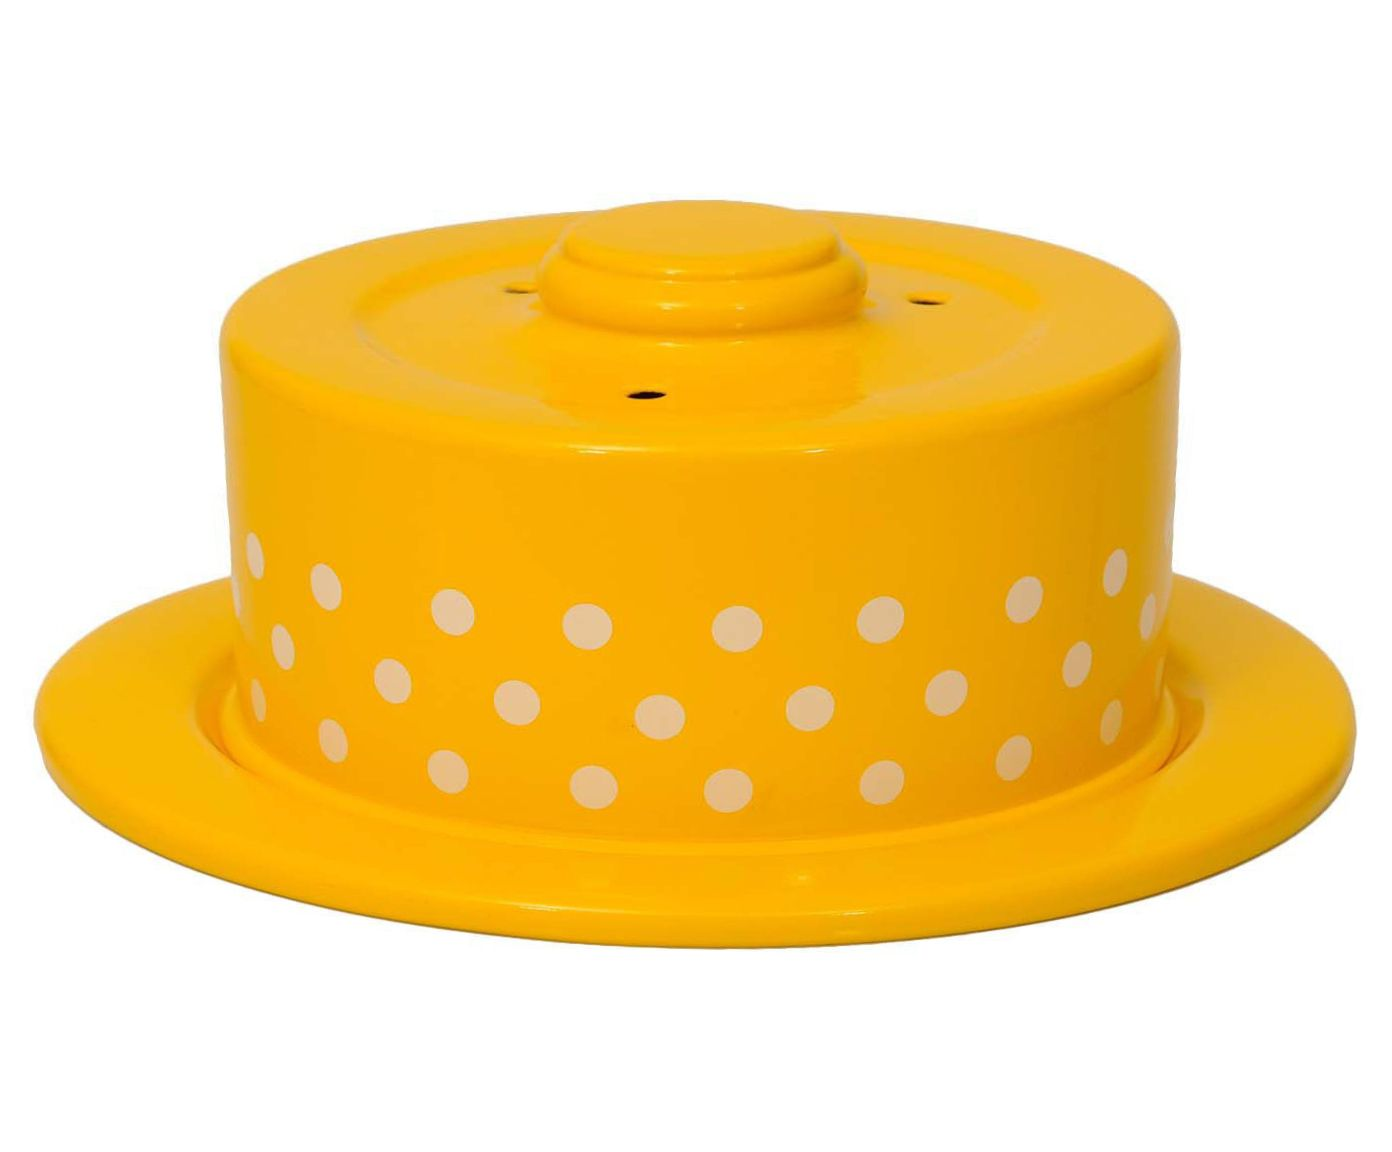 Boleira Polka Dots - Amarela e Branca   Westwing.com.br